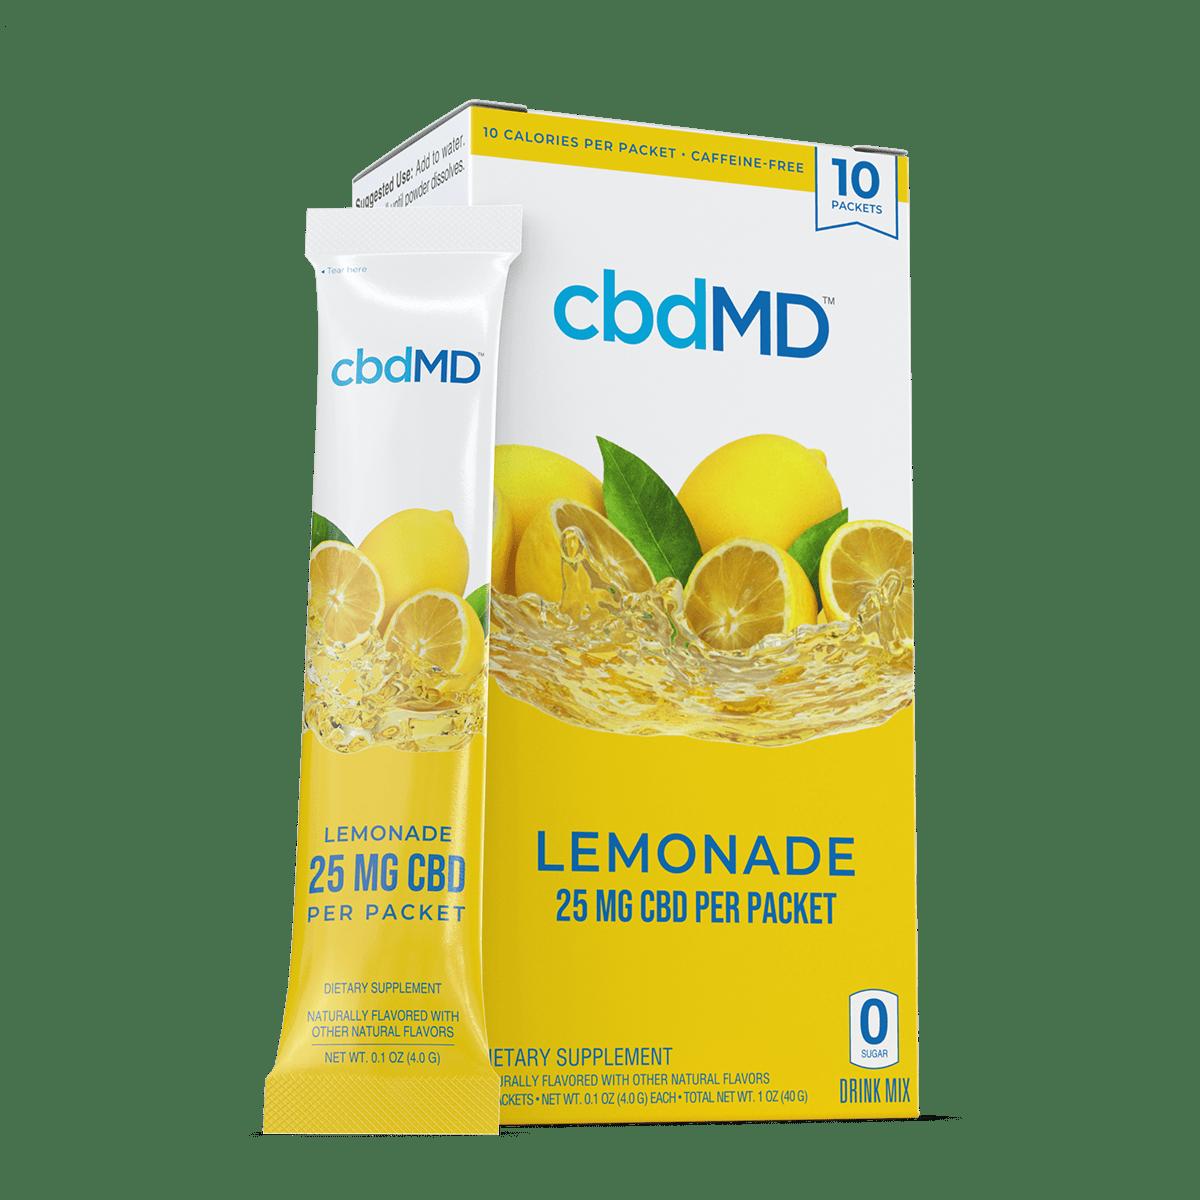 cbdMD, CBD Powdered Drink Mix, Broad Spectrum THC-Free, Lemonade, 10ct, 250mg CBD 1